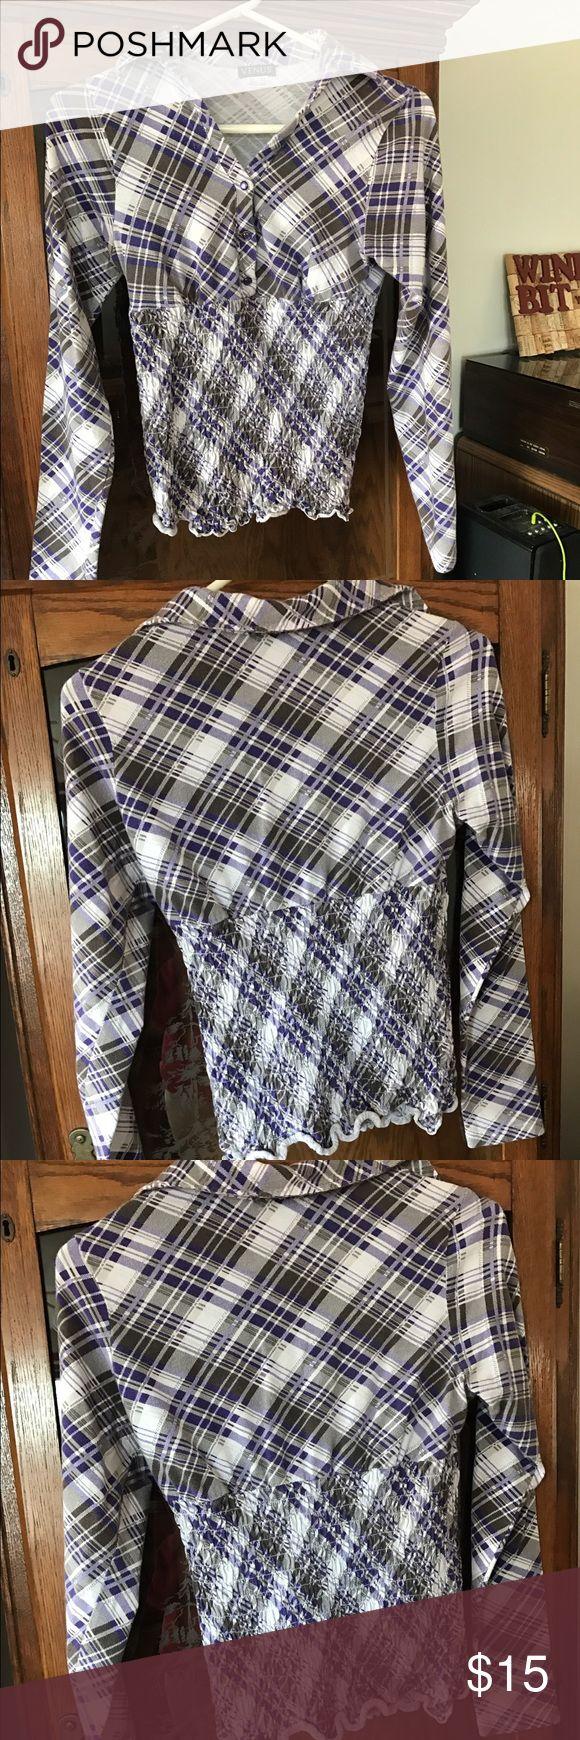 Plaid shirt! Cute plaid shirt! Dress it up or dress it down! Love this shirt! venus Tops Tees - Long Sleeve